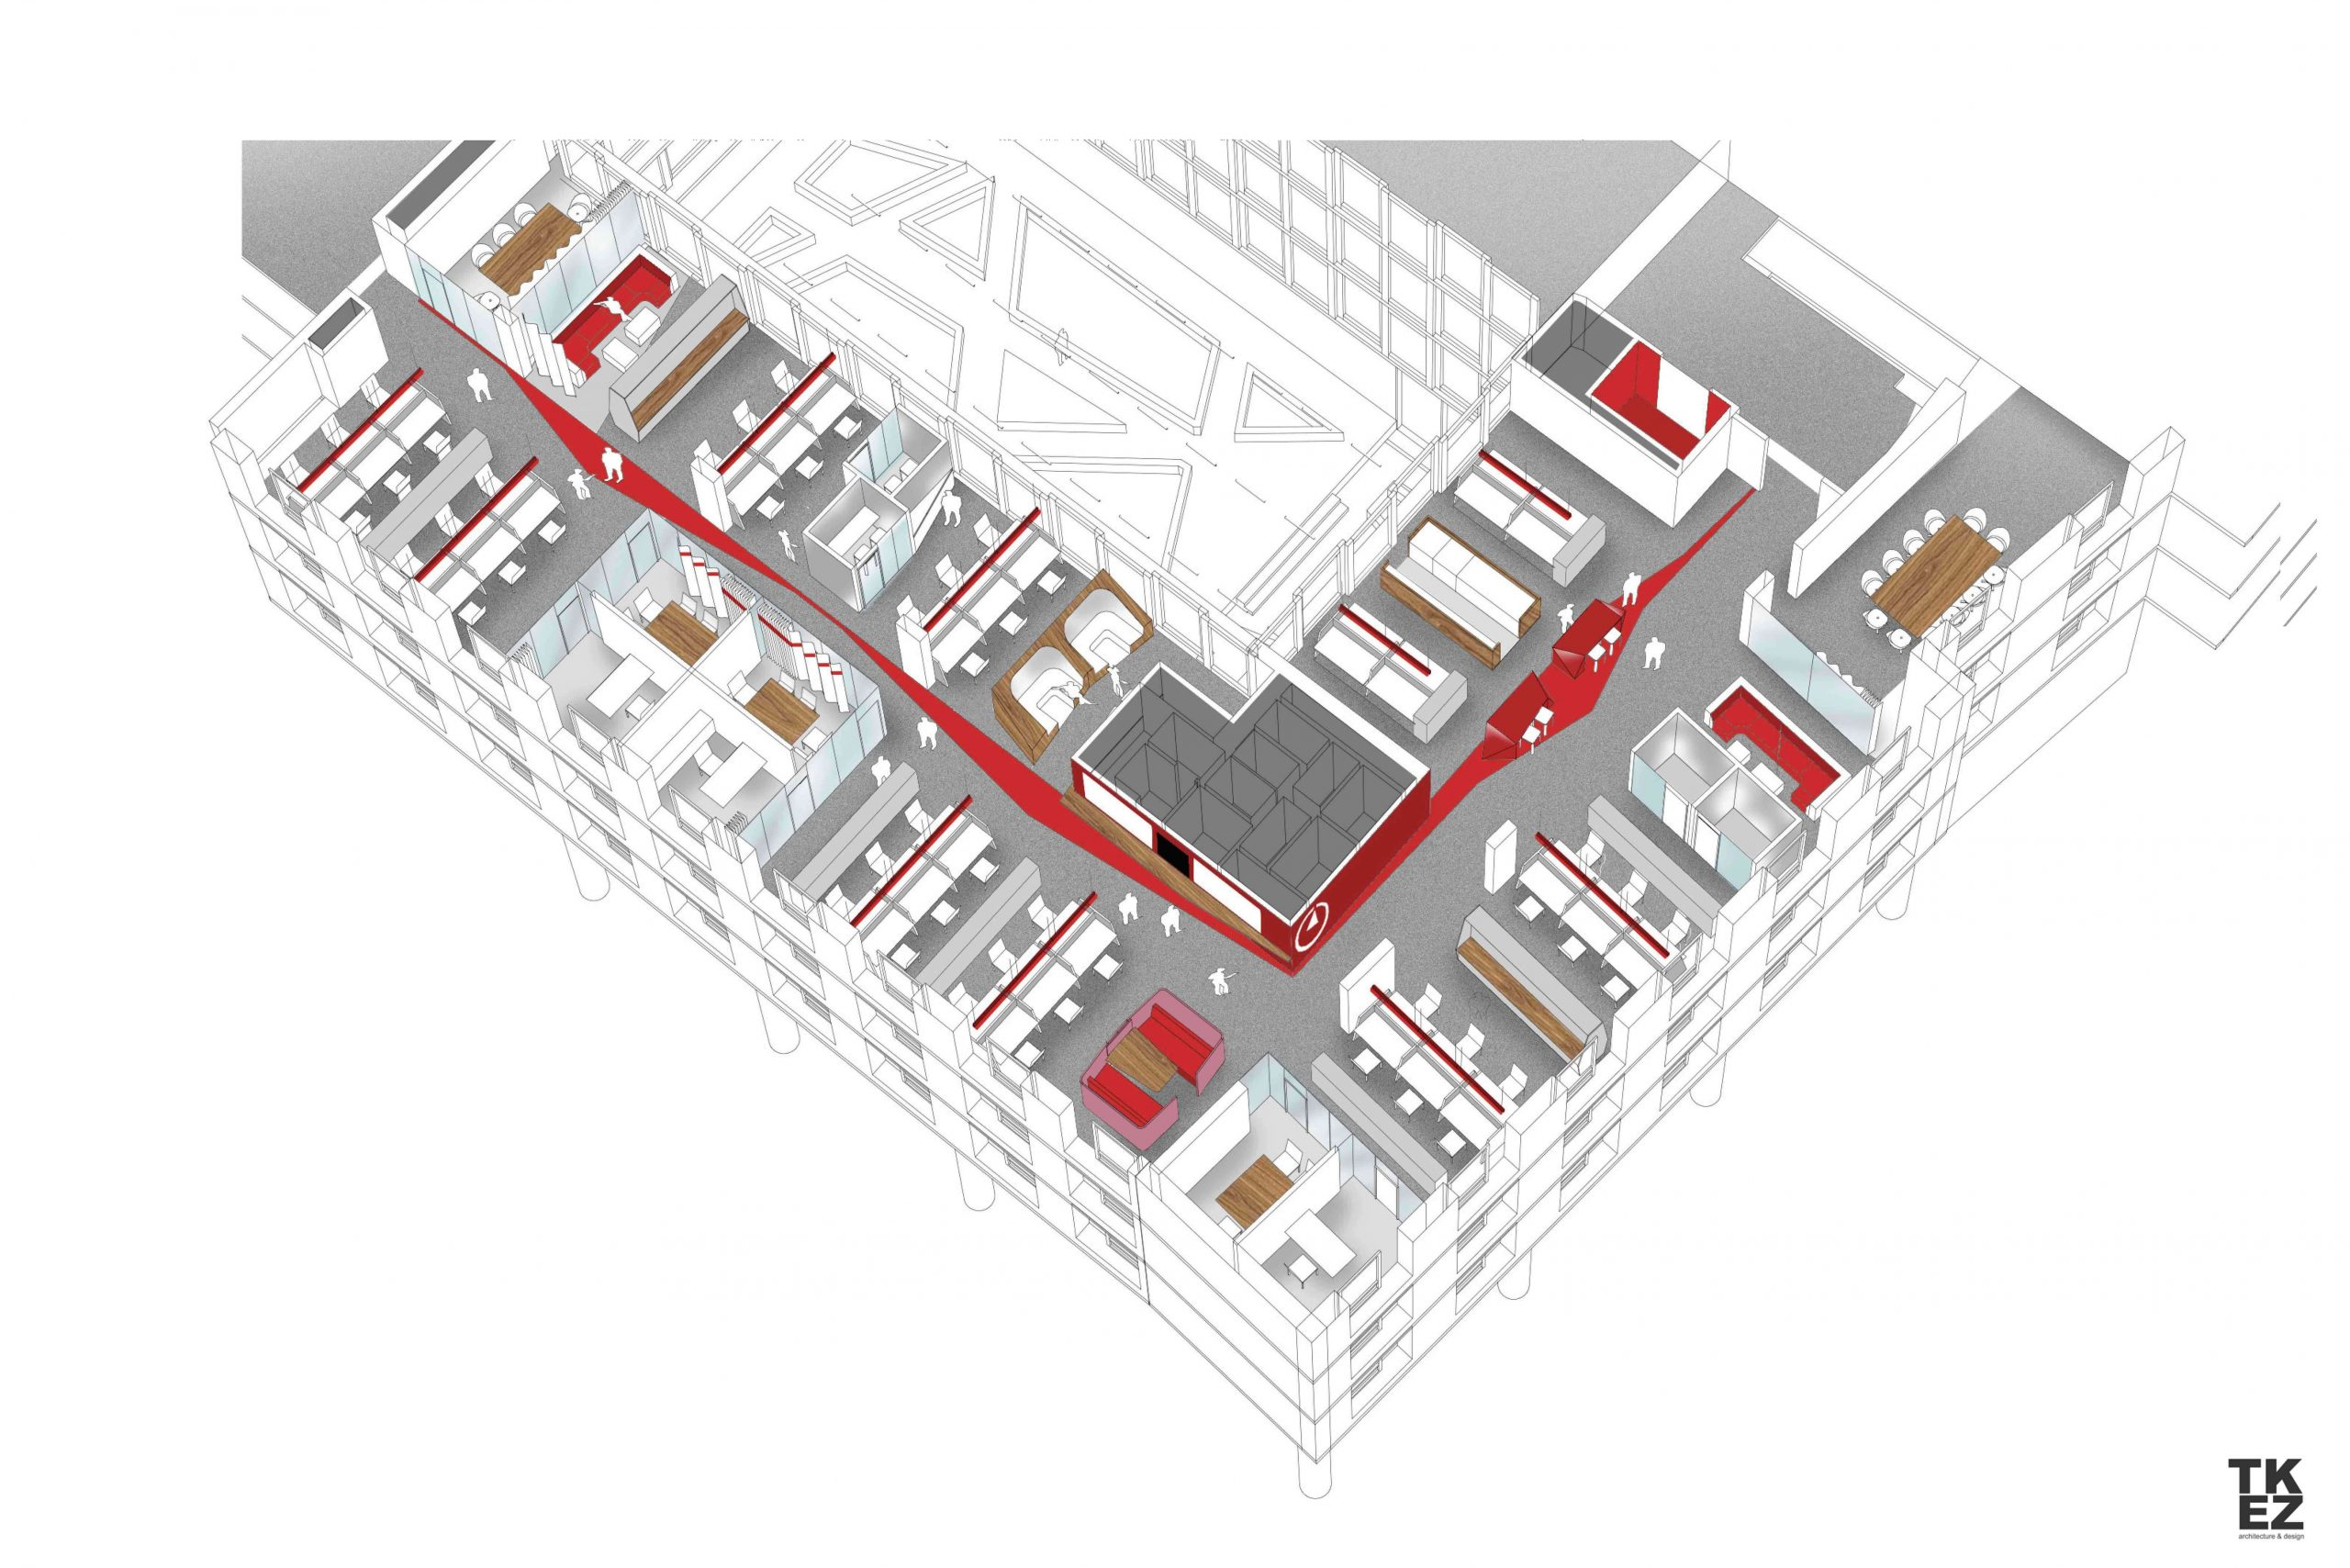 Neues Büro Bain & Company TKEZ München 4